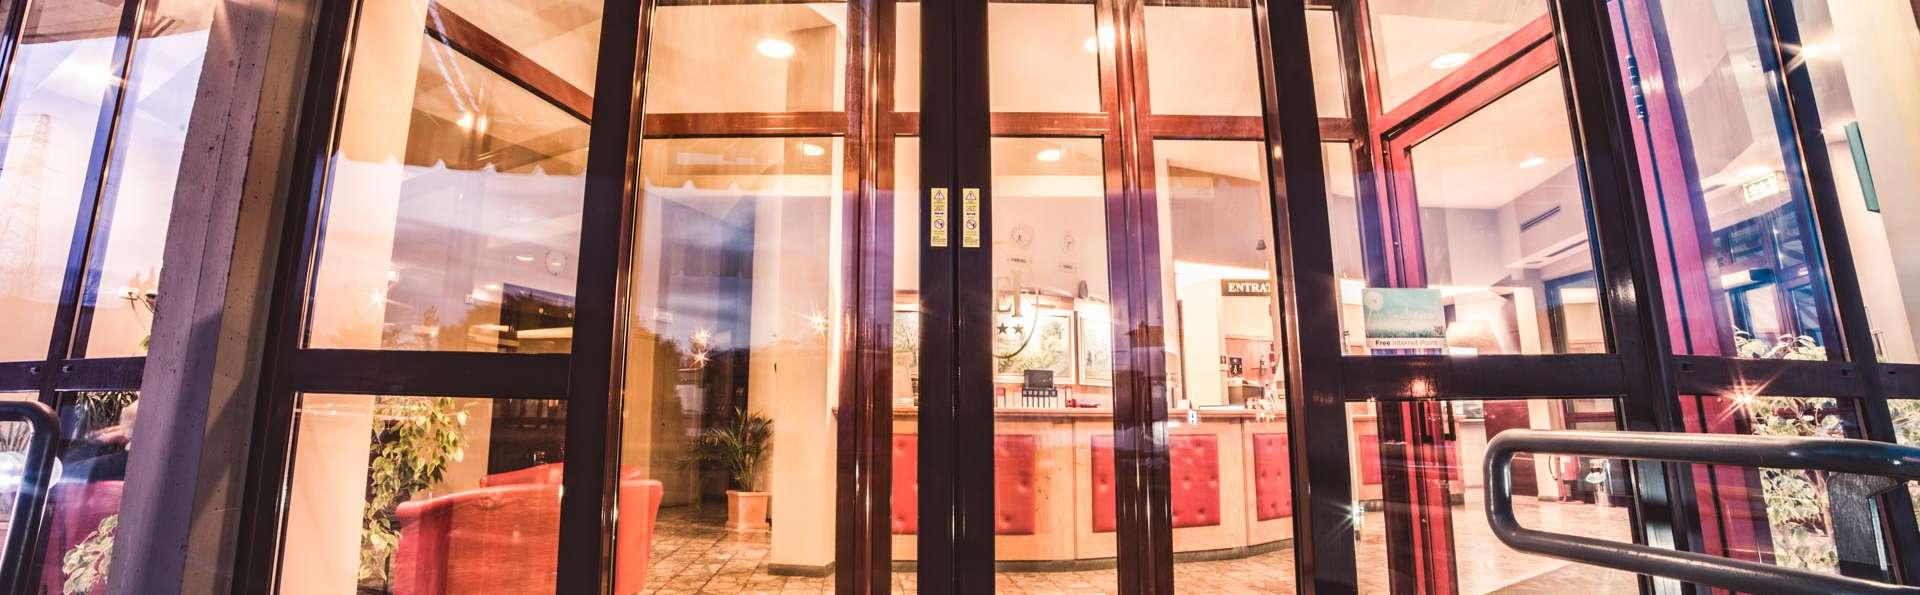 HG Hotel Europa - EDIT_FRONT_03.jpg